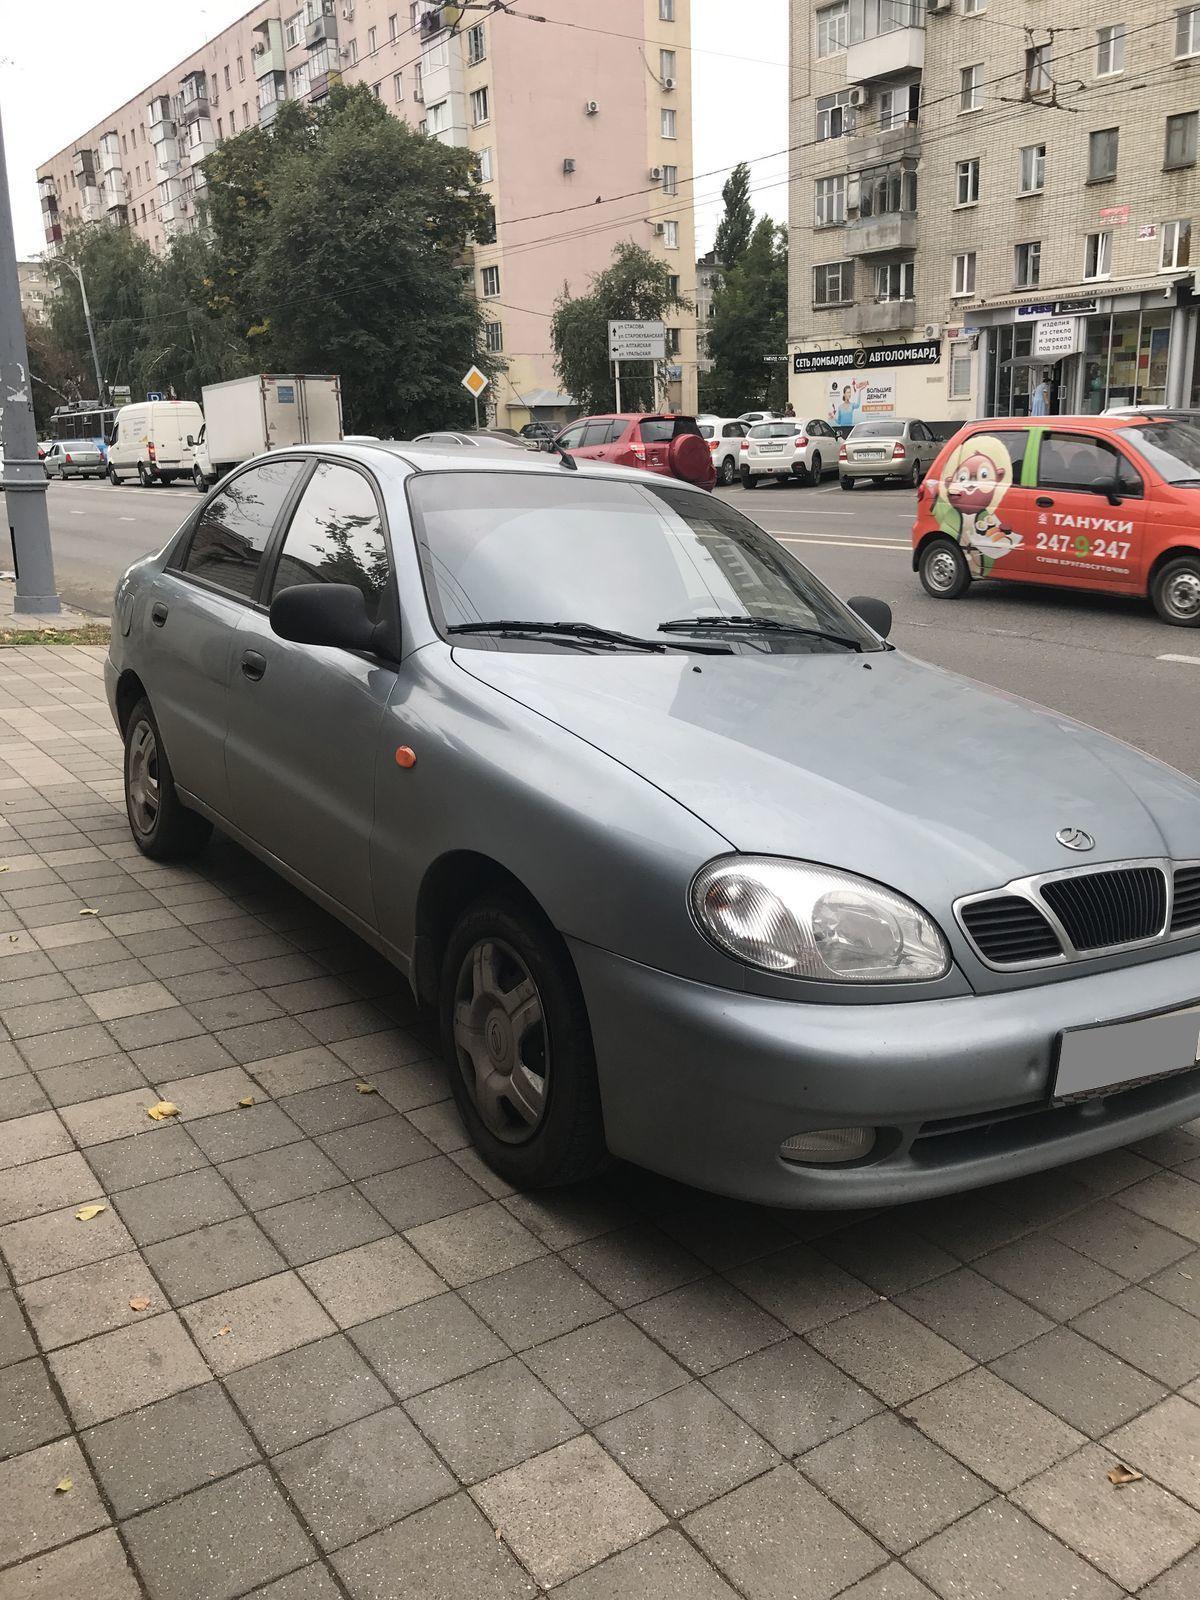 Автоломбард продажа авто краснодара займы под залог авто бийск